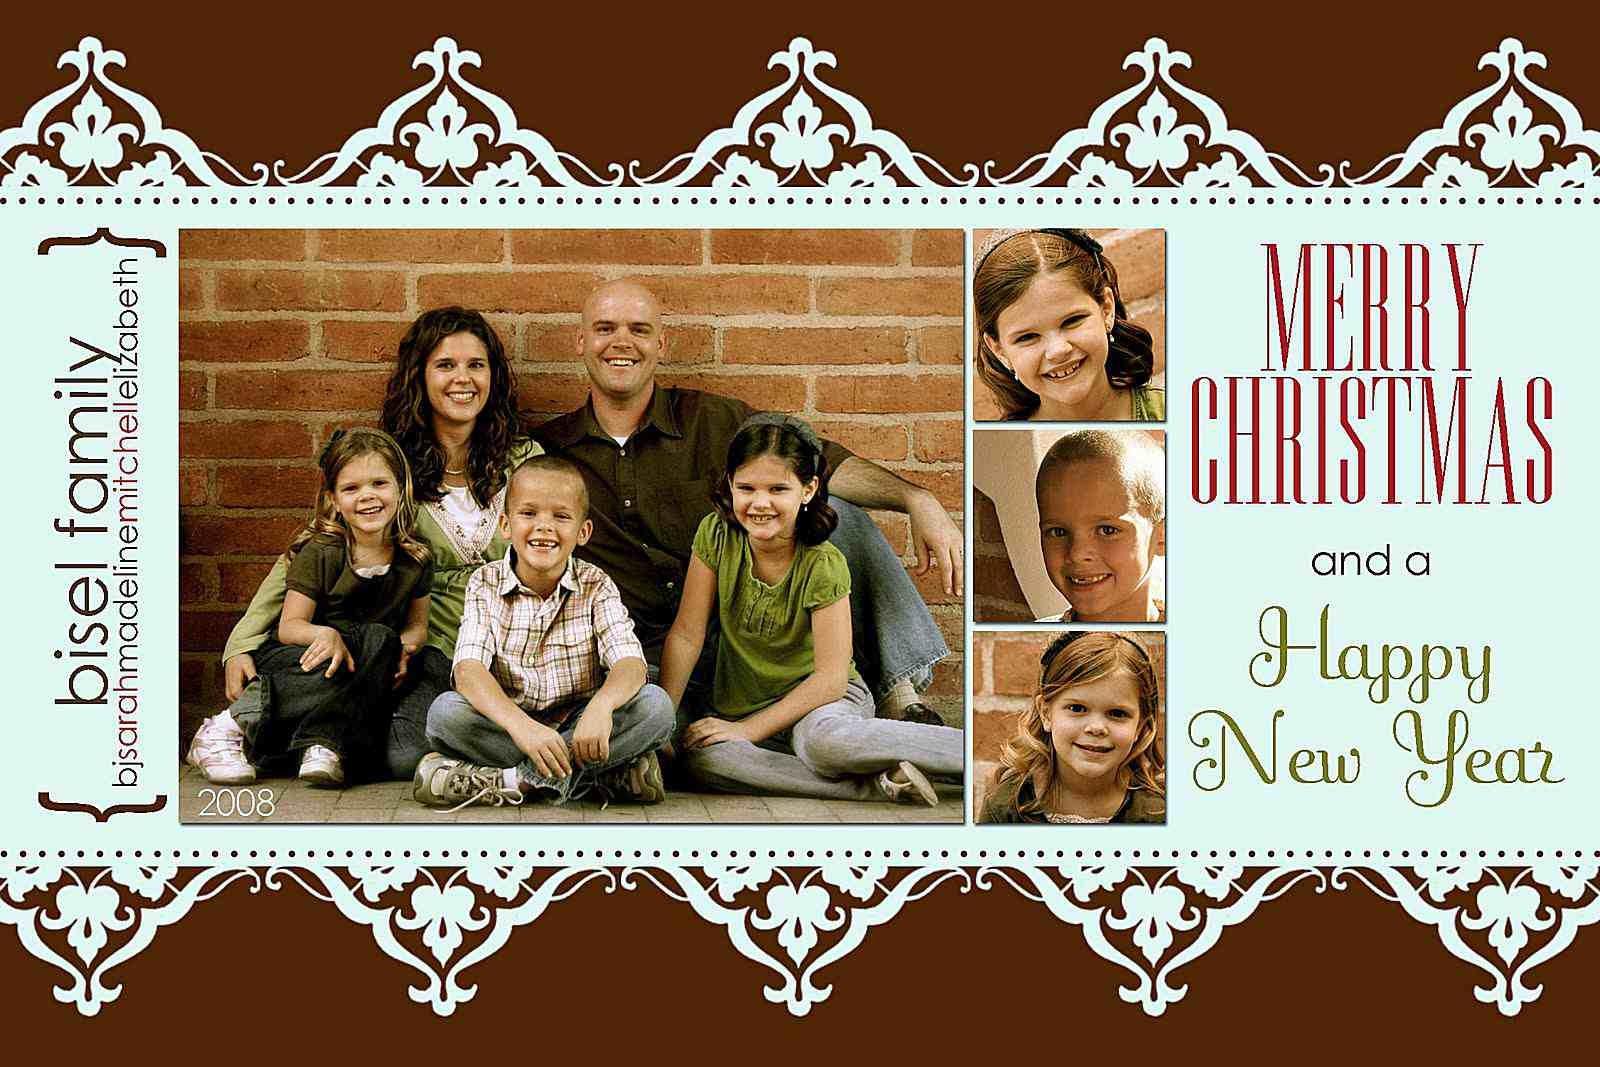 11 Free Templates For Christmas Photo Cards - Free Printable Christmas Photo Collage